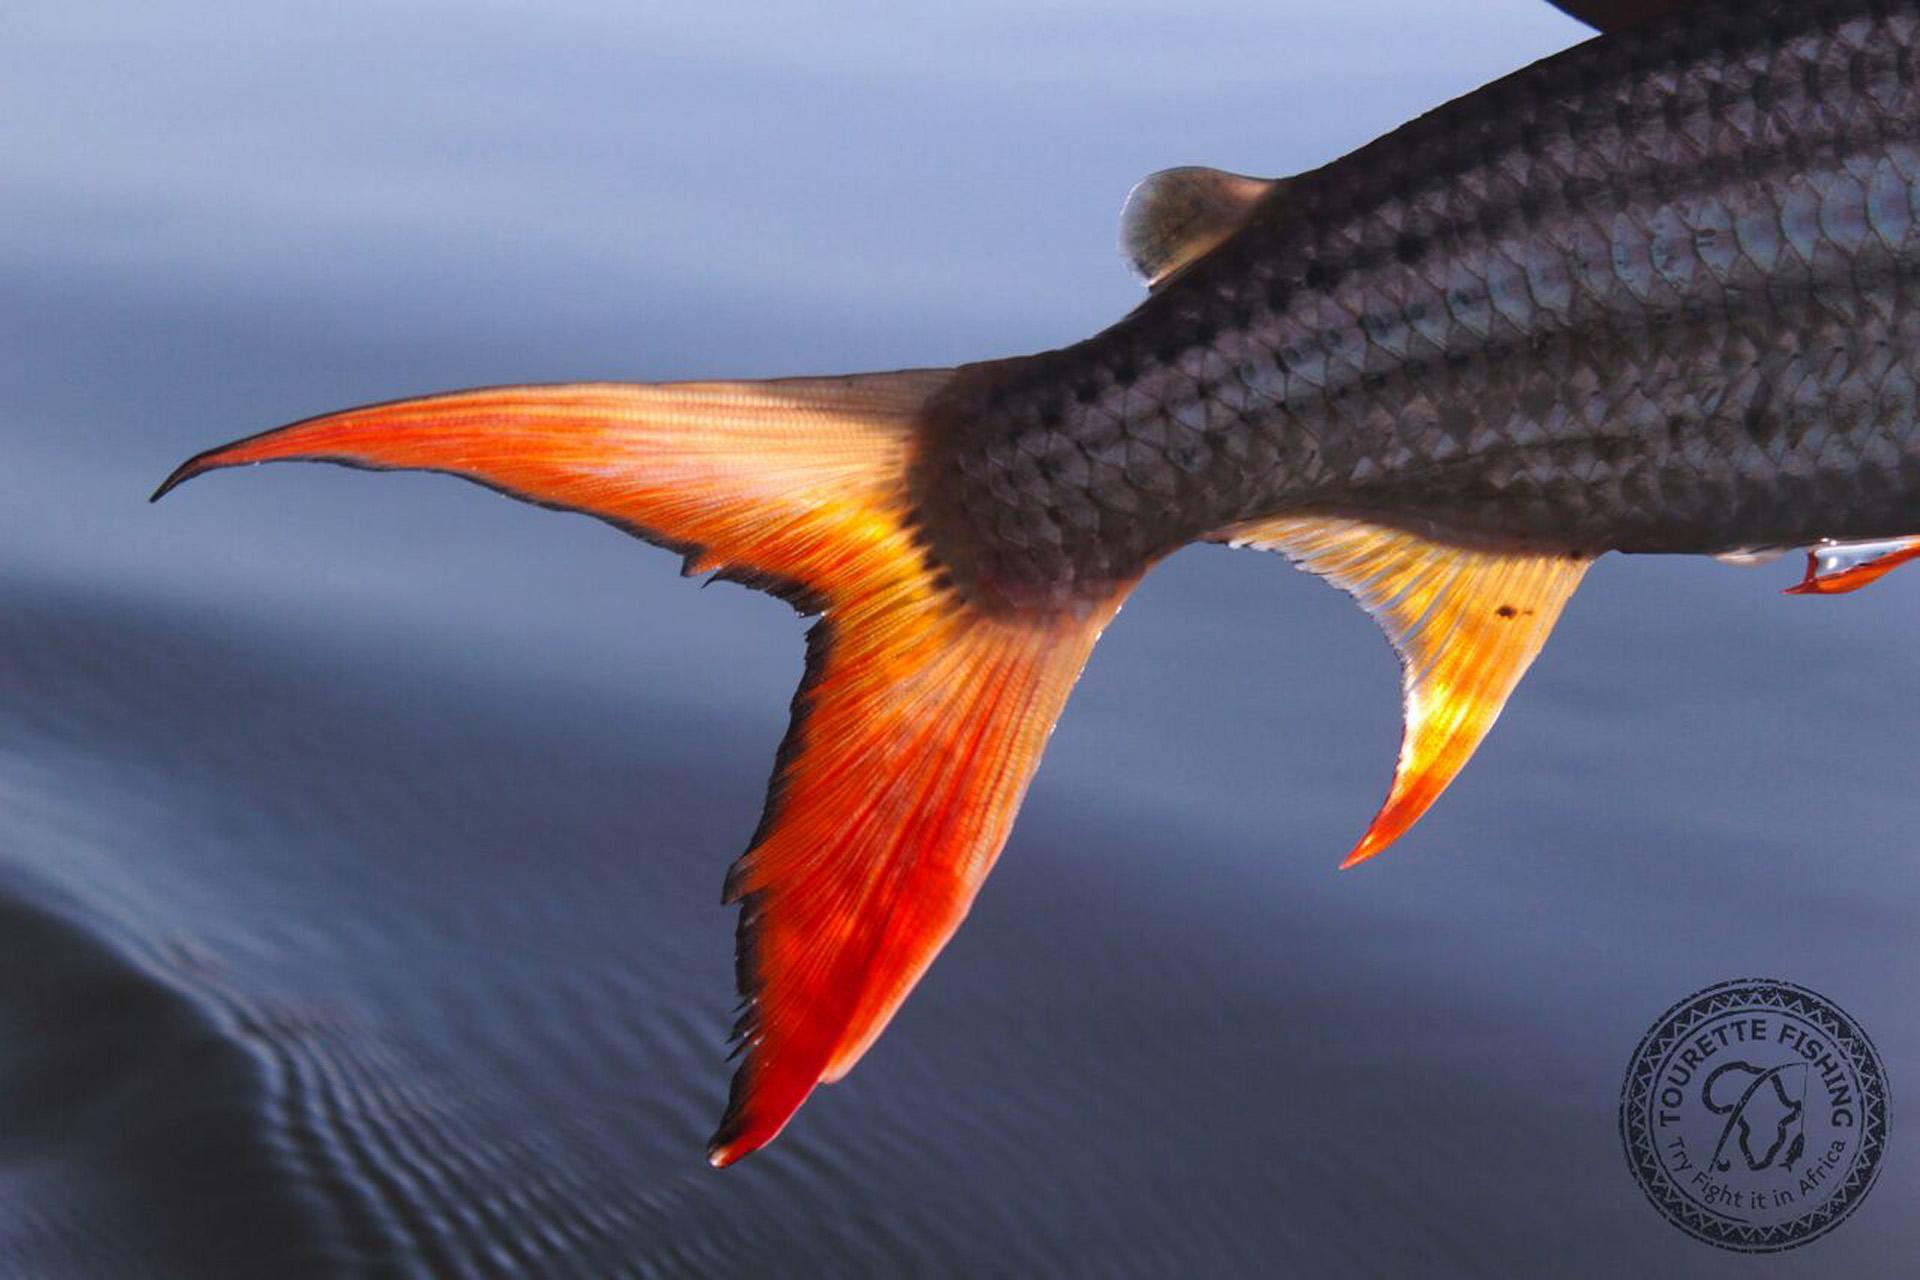 okavango-barbel-run-tigerfish-season-2016-week-1-tourette-fishing-blog